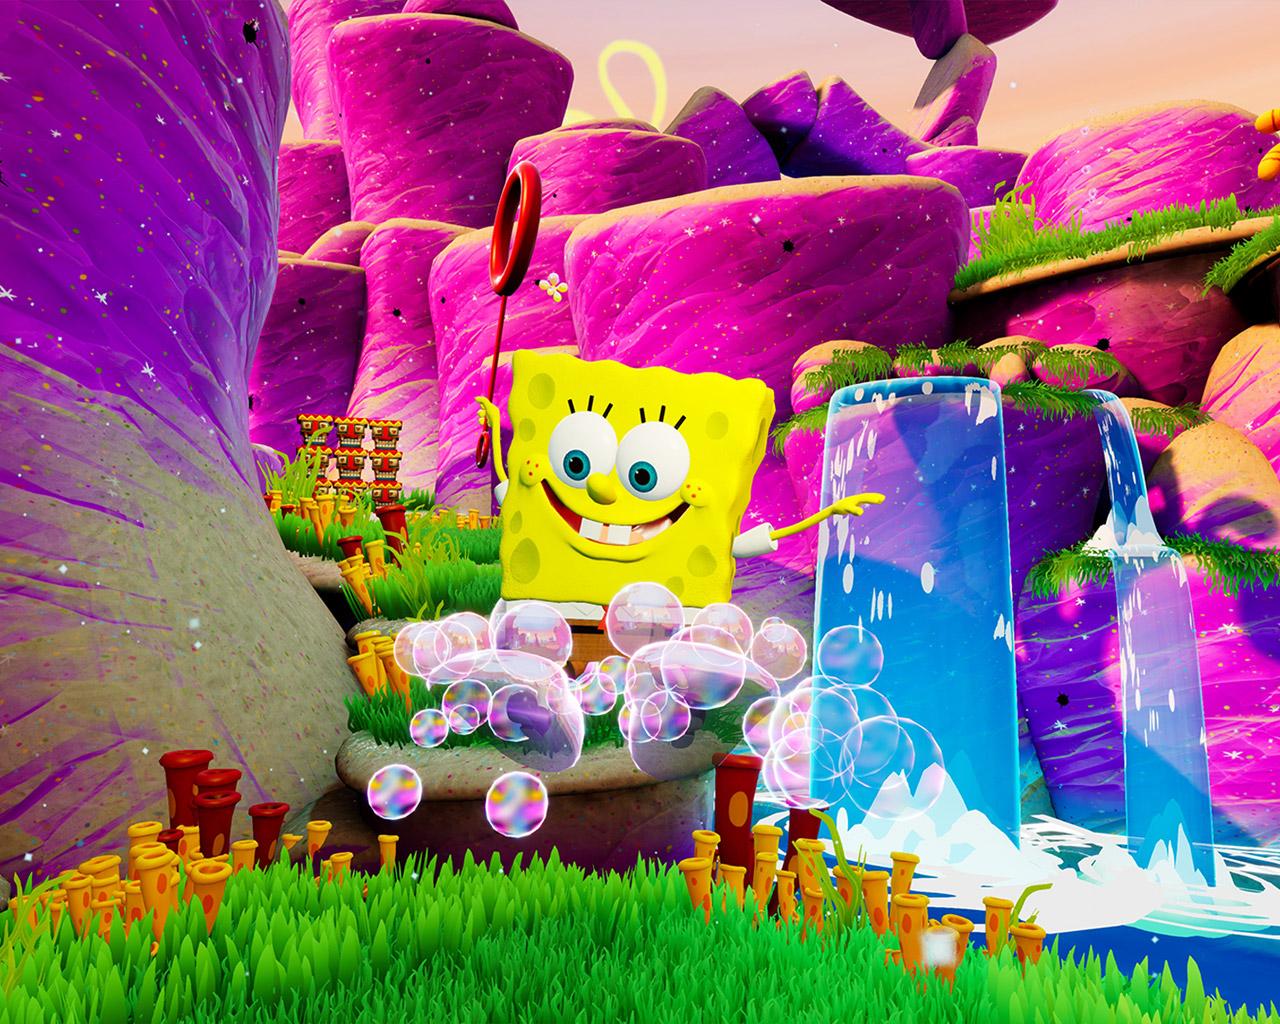 SpongeBob SquarePants: Battle for Bikini Bottom Wallpaper in 1280x1024